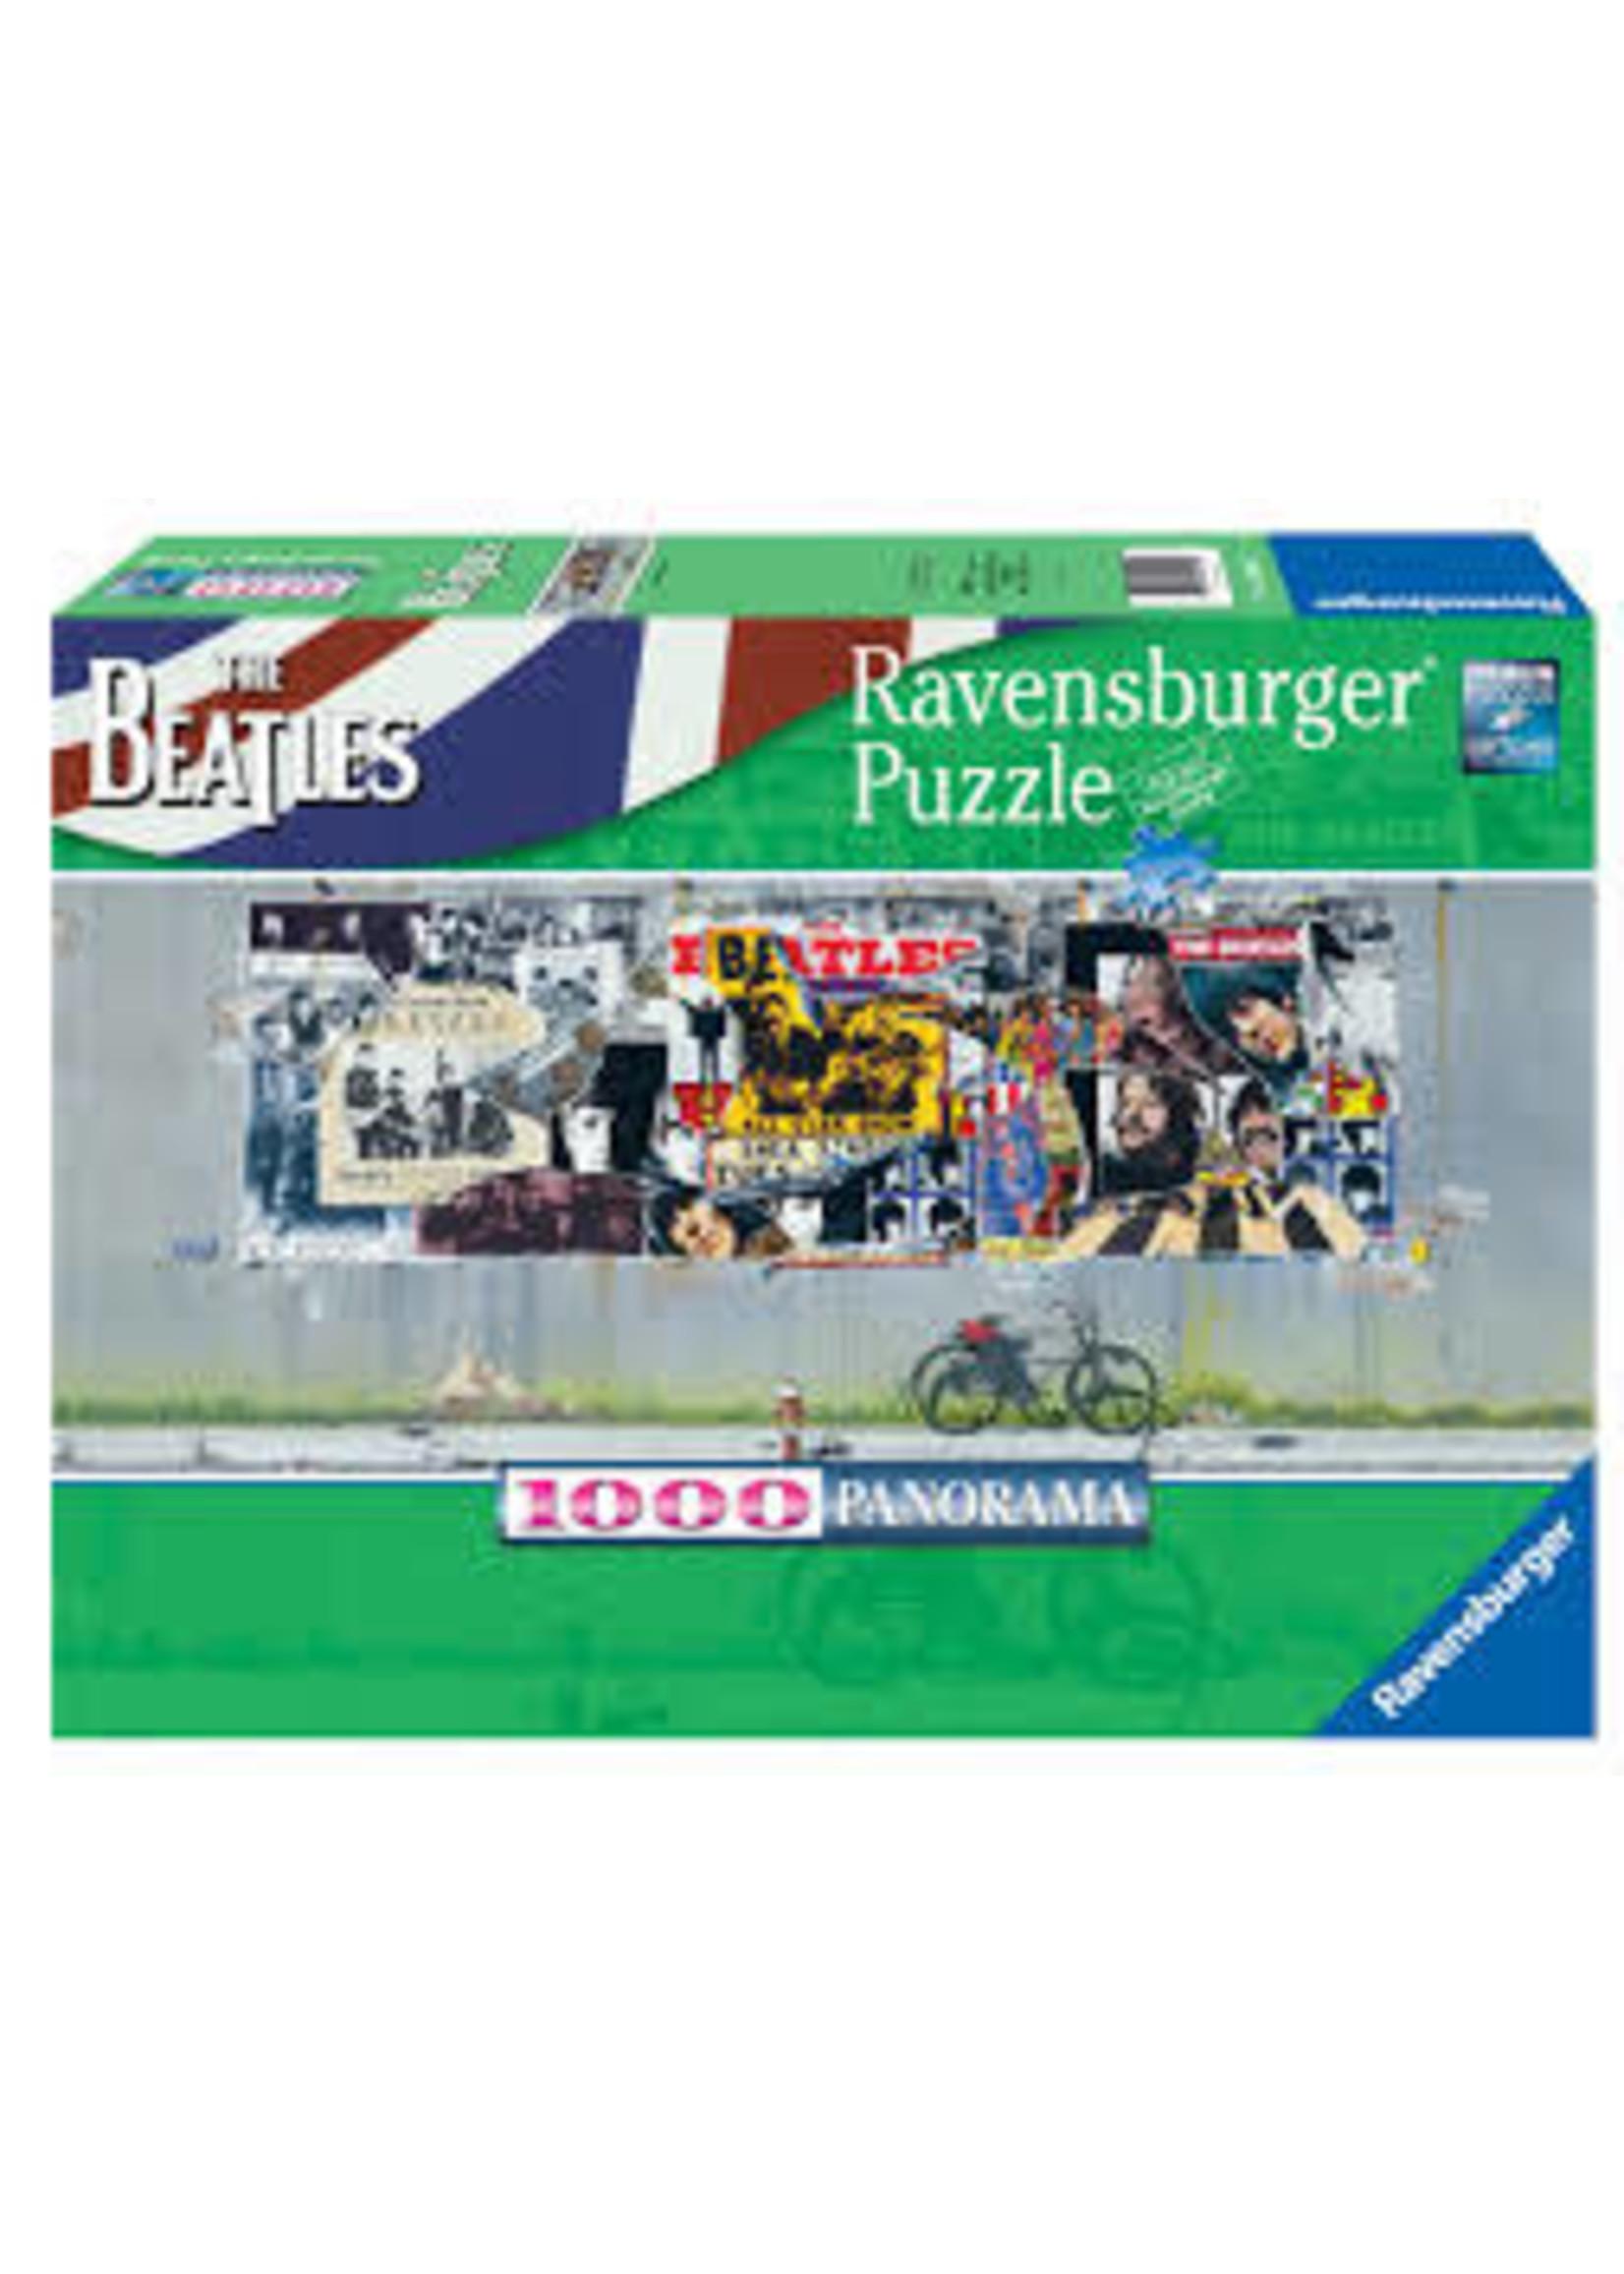 Ravensburger 1000pc puzzle The Beatles Anthology Wall